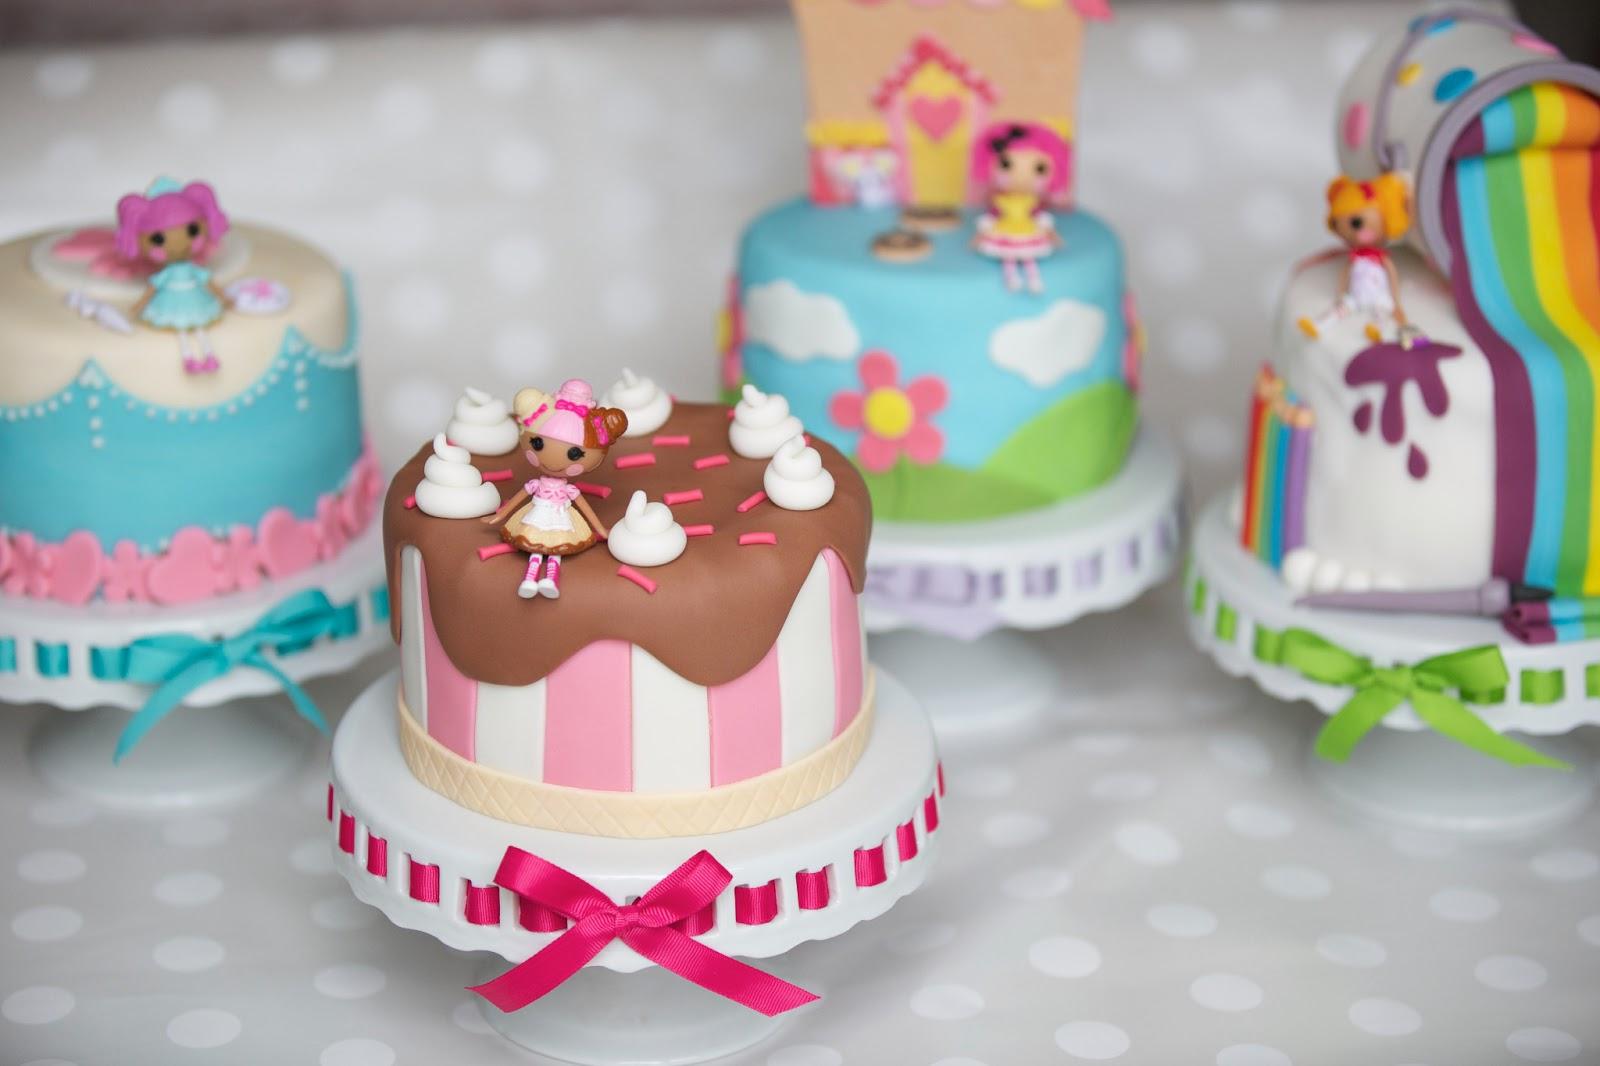 Groovy 12 Lalaloopsy Bday Cakes Photo Lalaloopsy Birthday Cake Art Funny Birthday Cards Online Overcheapnameinfo